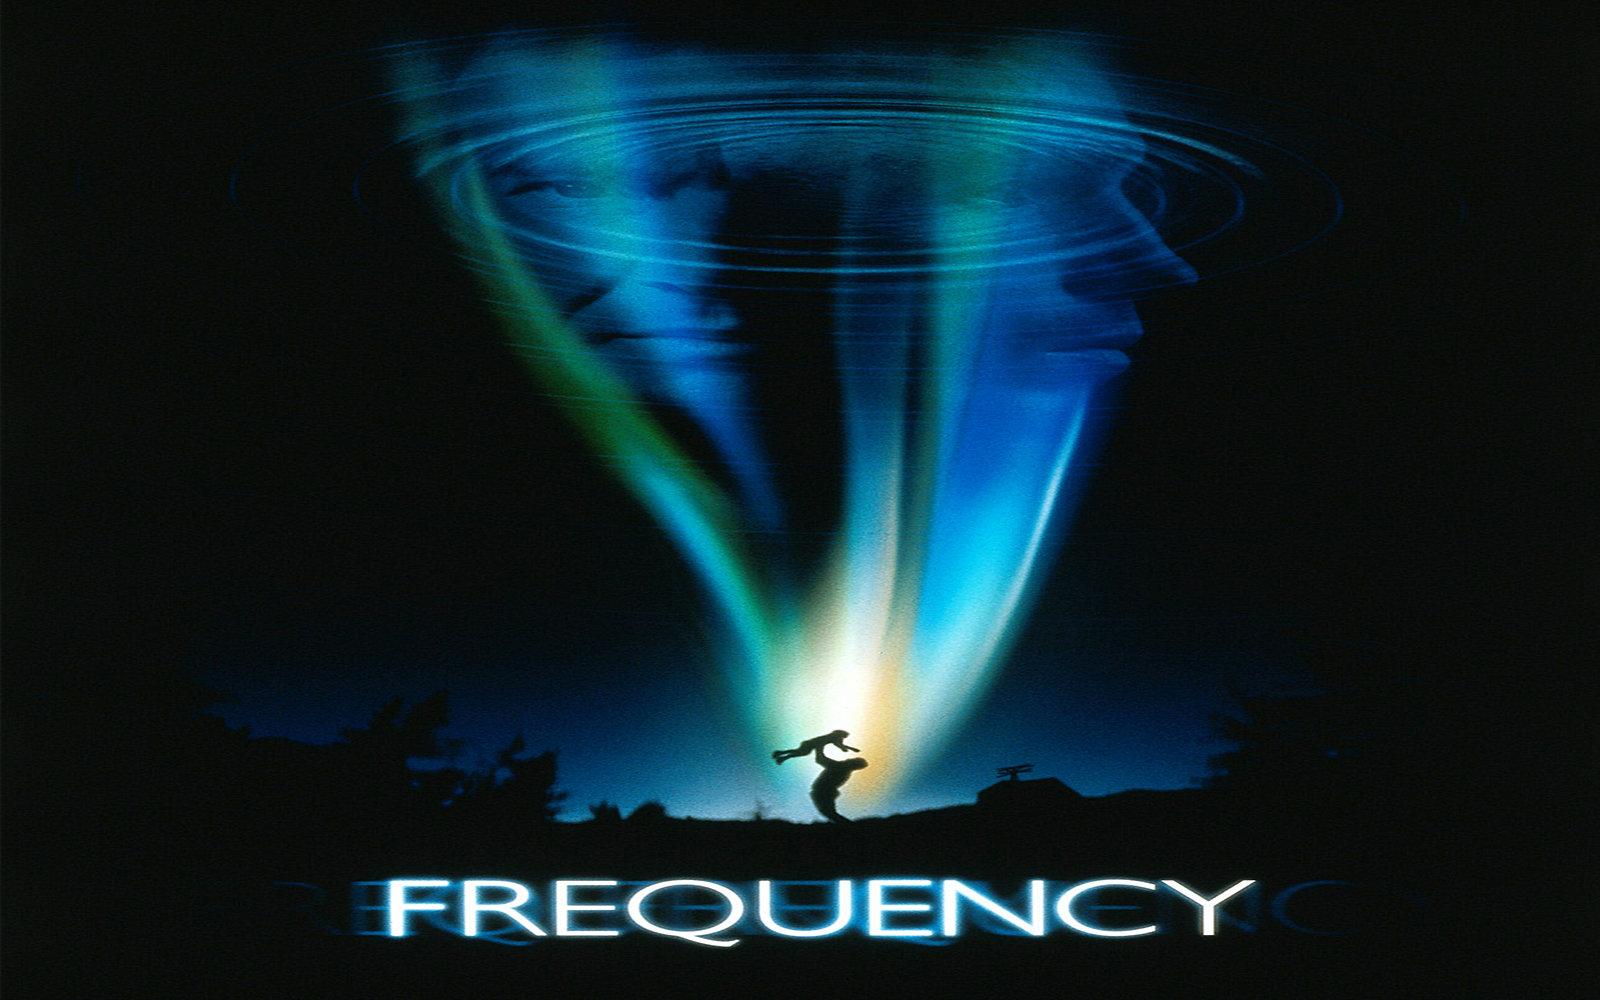 【BD•1080P】【科幻/剧情】黑洞频率.Frequency(2000)【中英字幕】【吉姆·卡维泽】